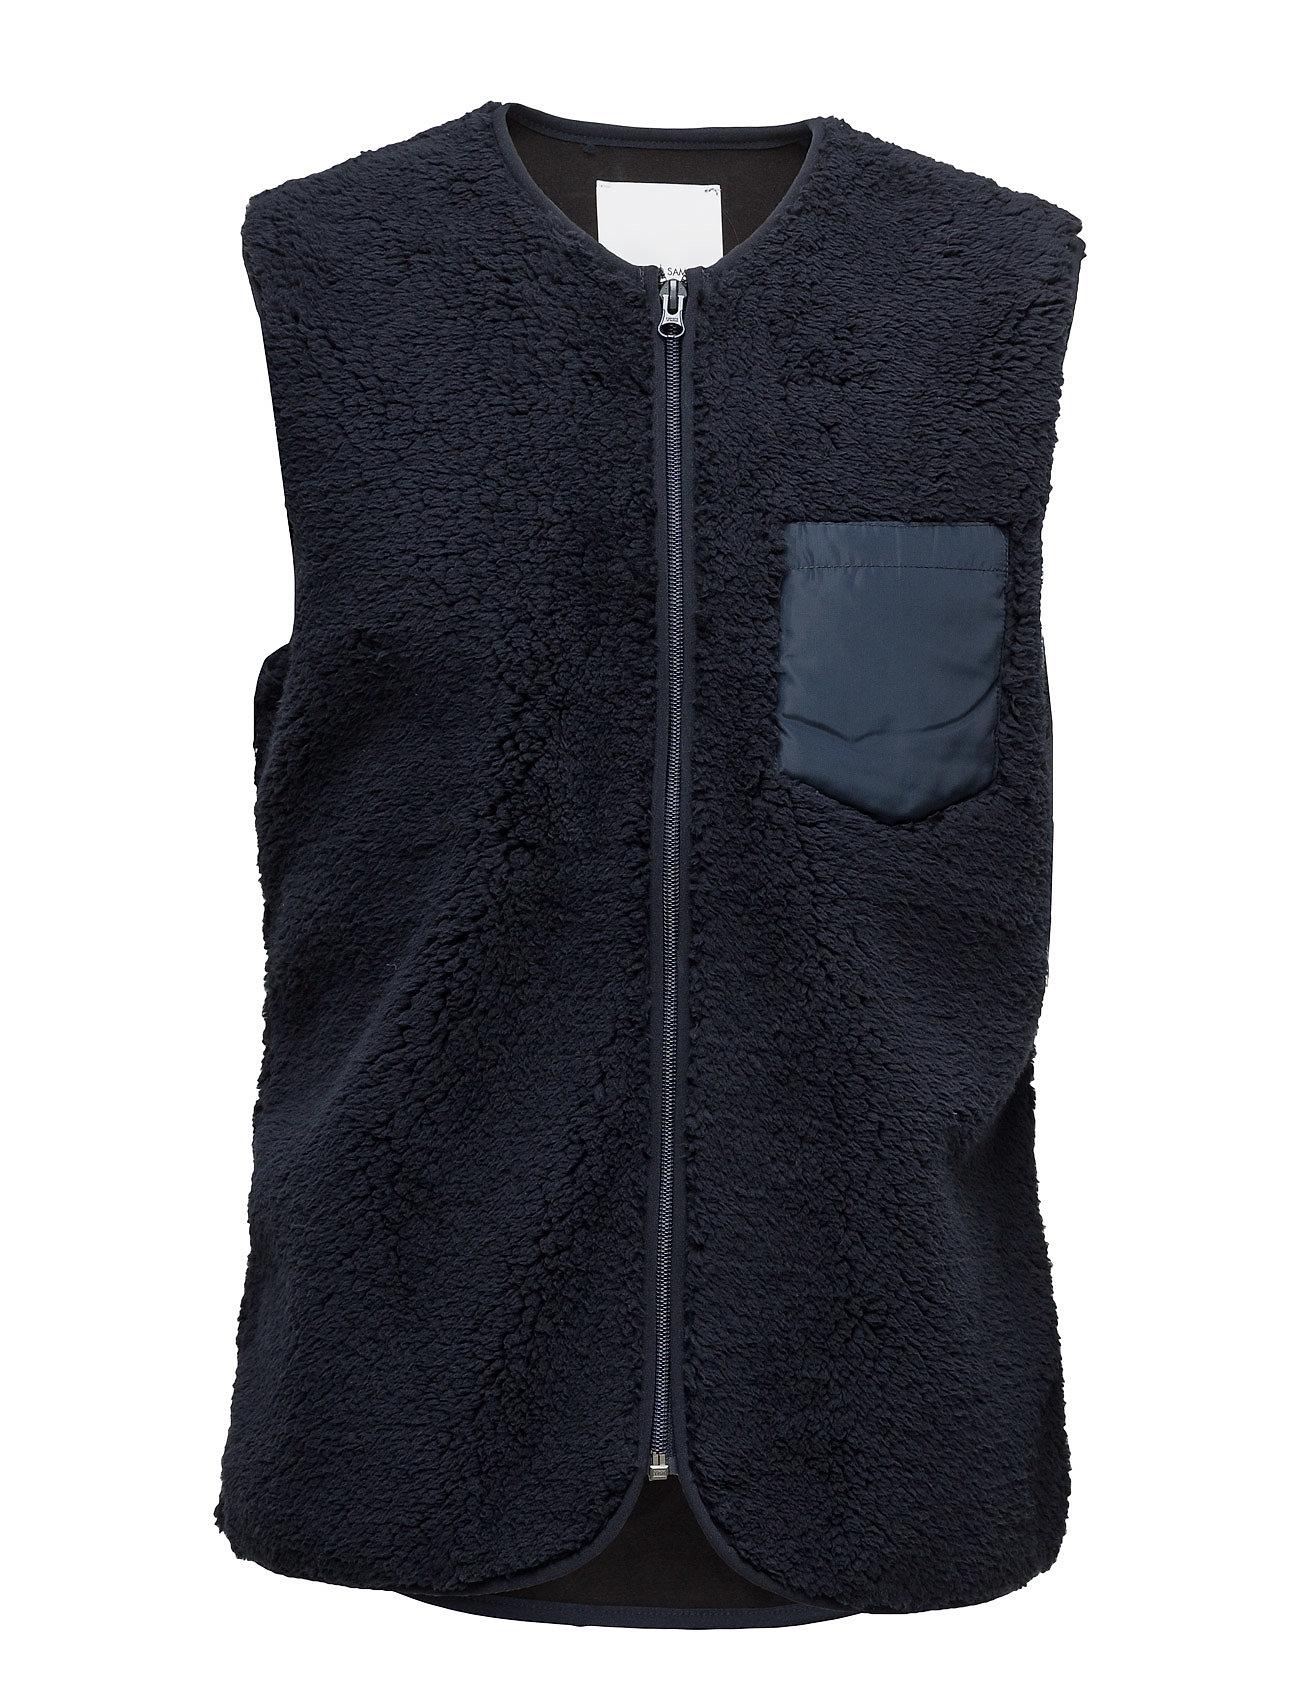 Chesley waistcoat 7980 fra samsã¸e & samsã¸e fra boozt.com dk